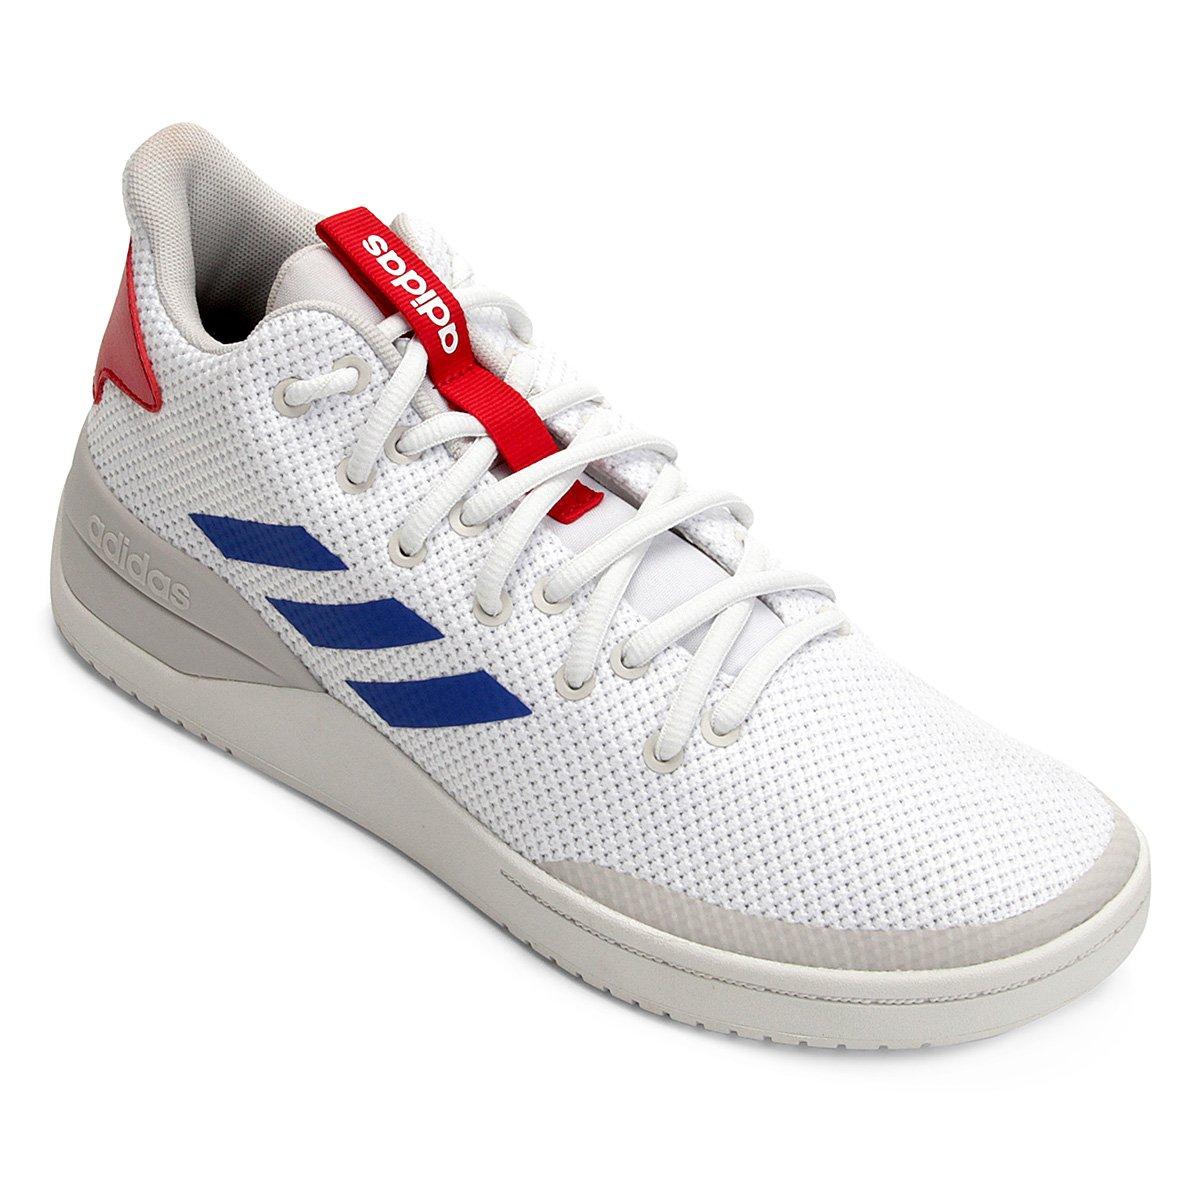 2d750d33baf Tênis Adidas Retro Bball Masculino. undefined